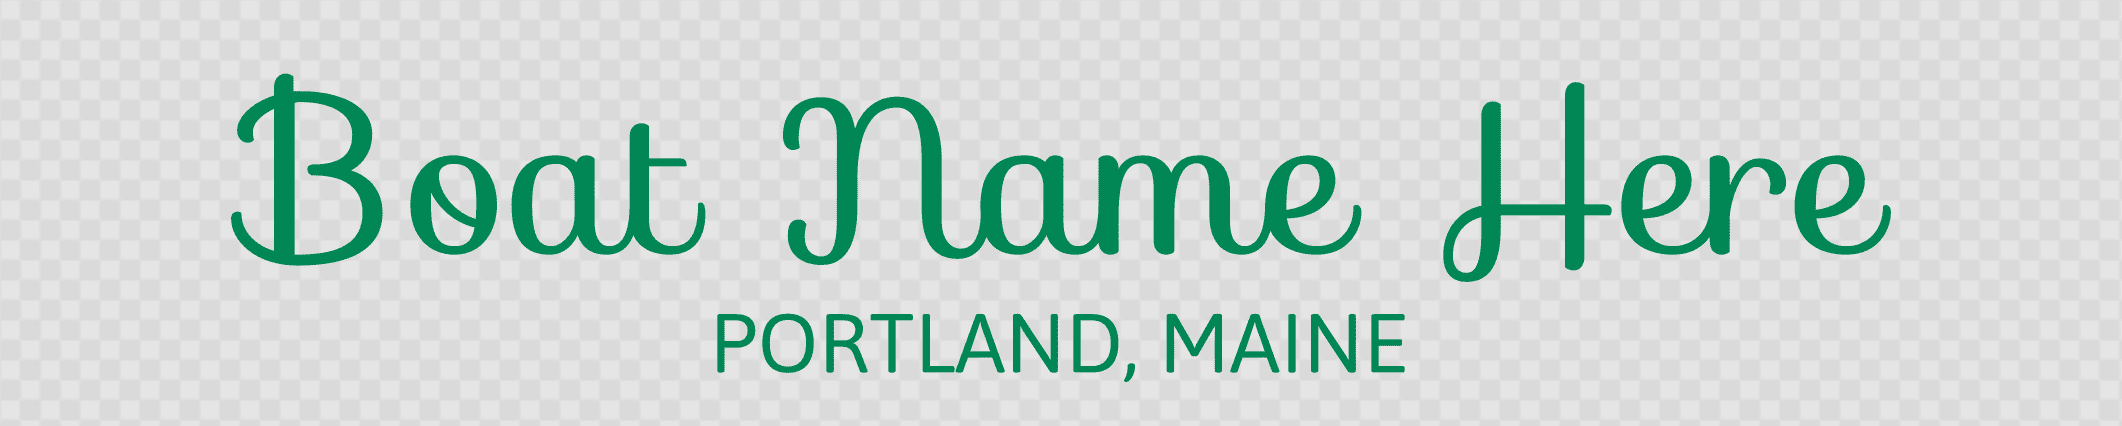 Maine hailing port template